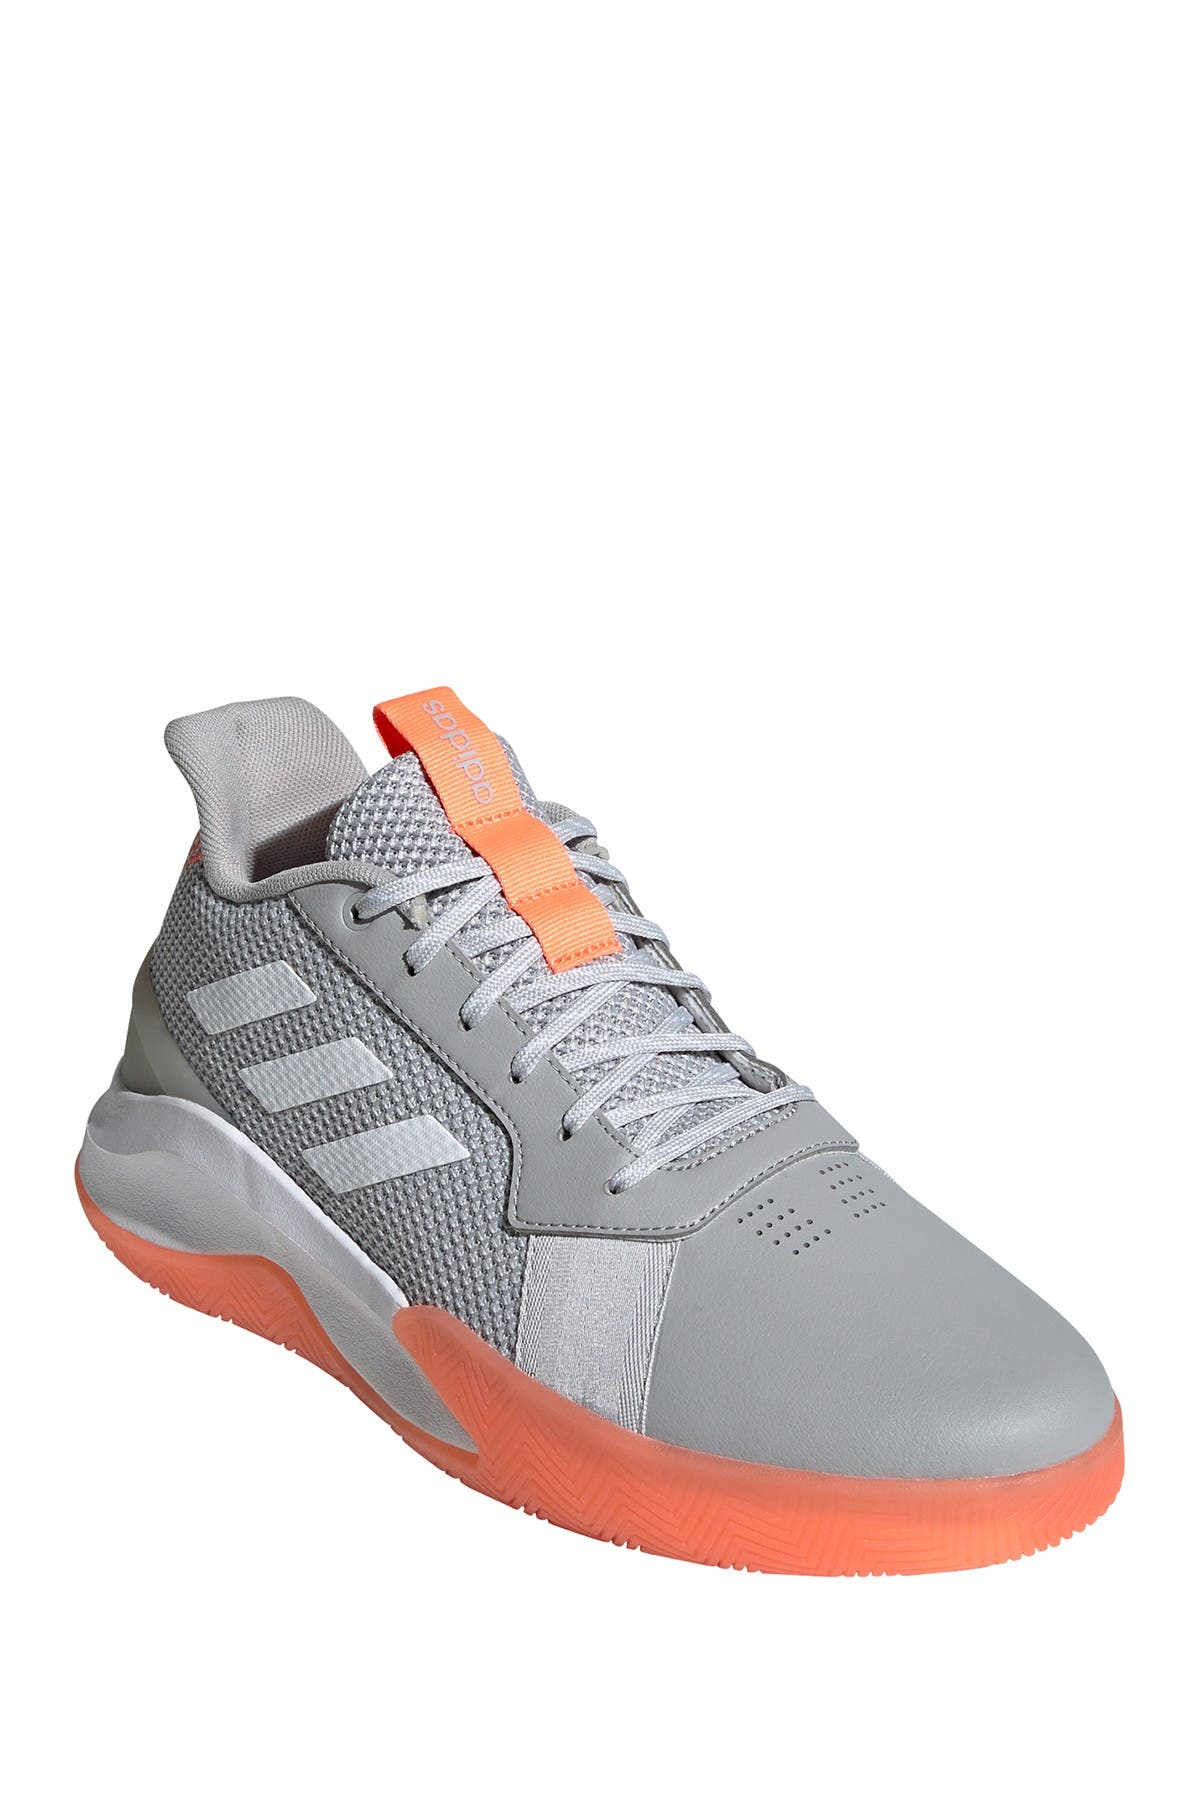 Image of adidas RunTheGame Basketball Shoe